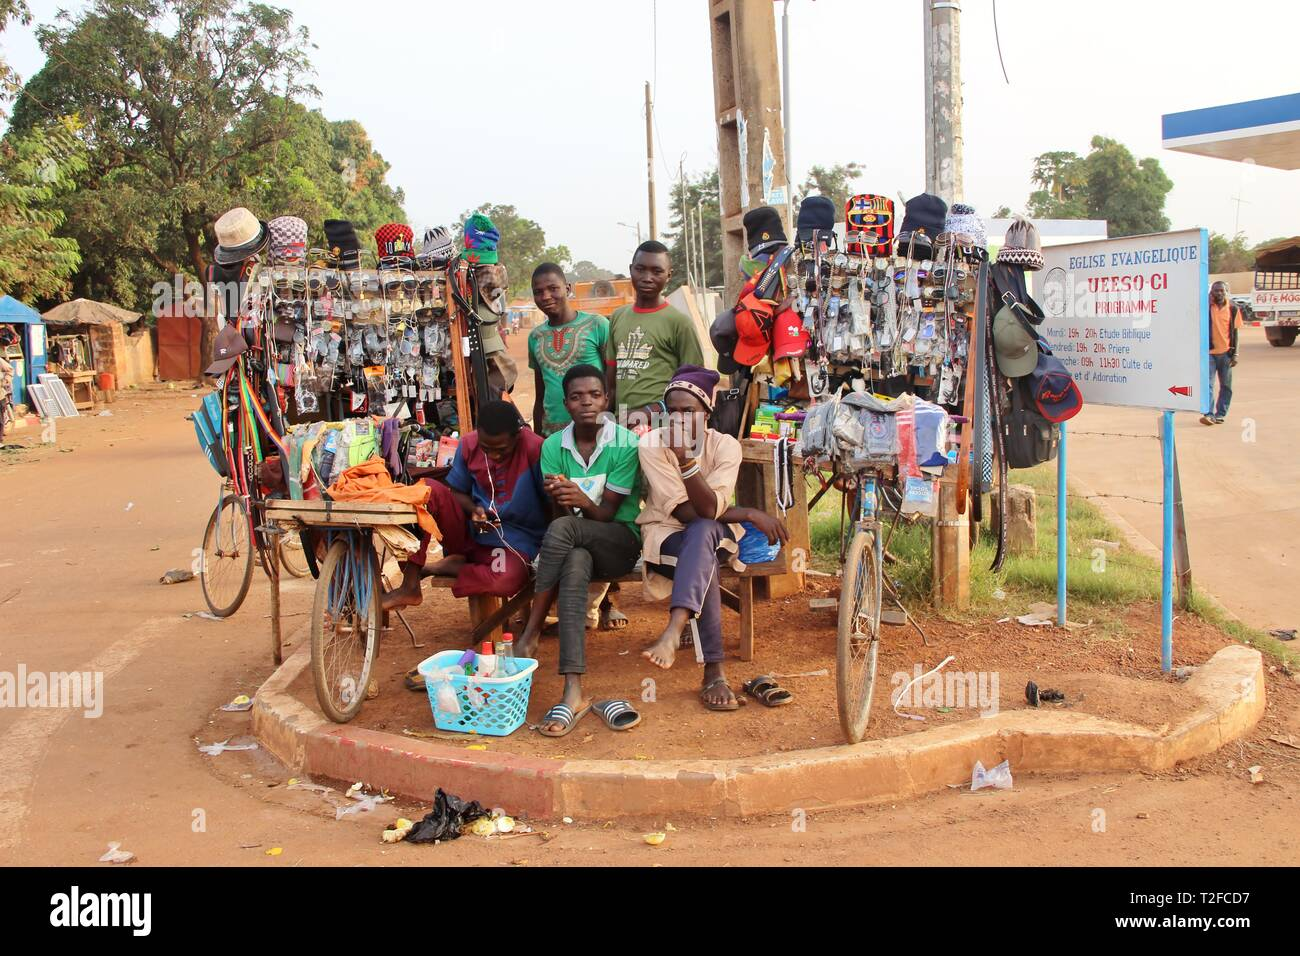 Street sellers, Ferké, Côte d'Ivoire (Ivory Coast) - Stock Image